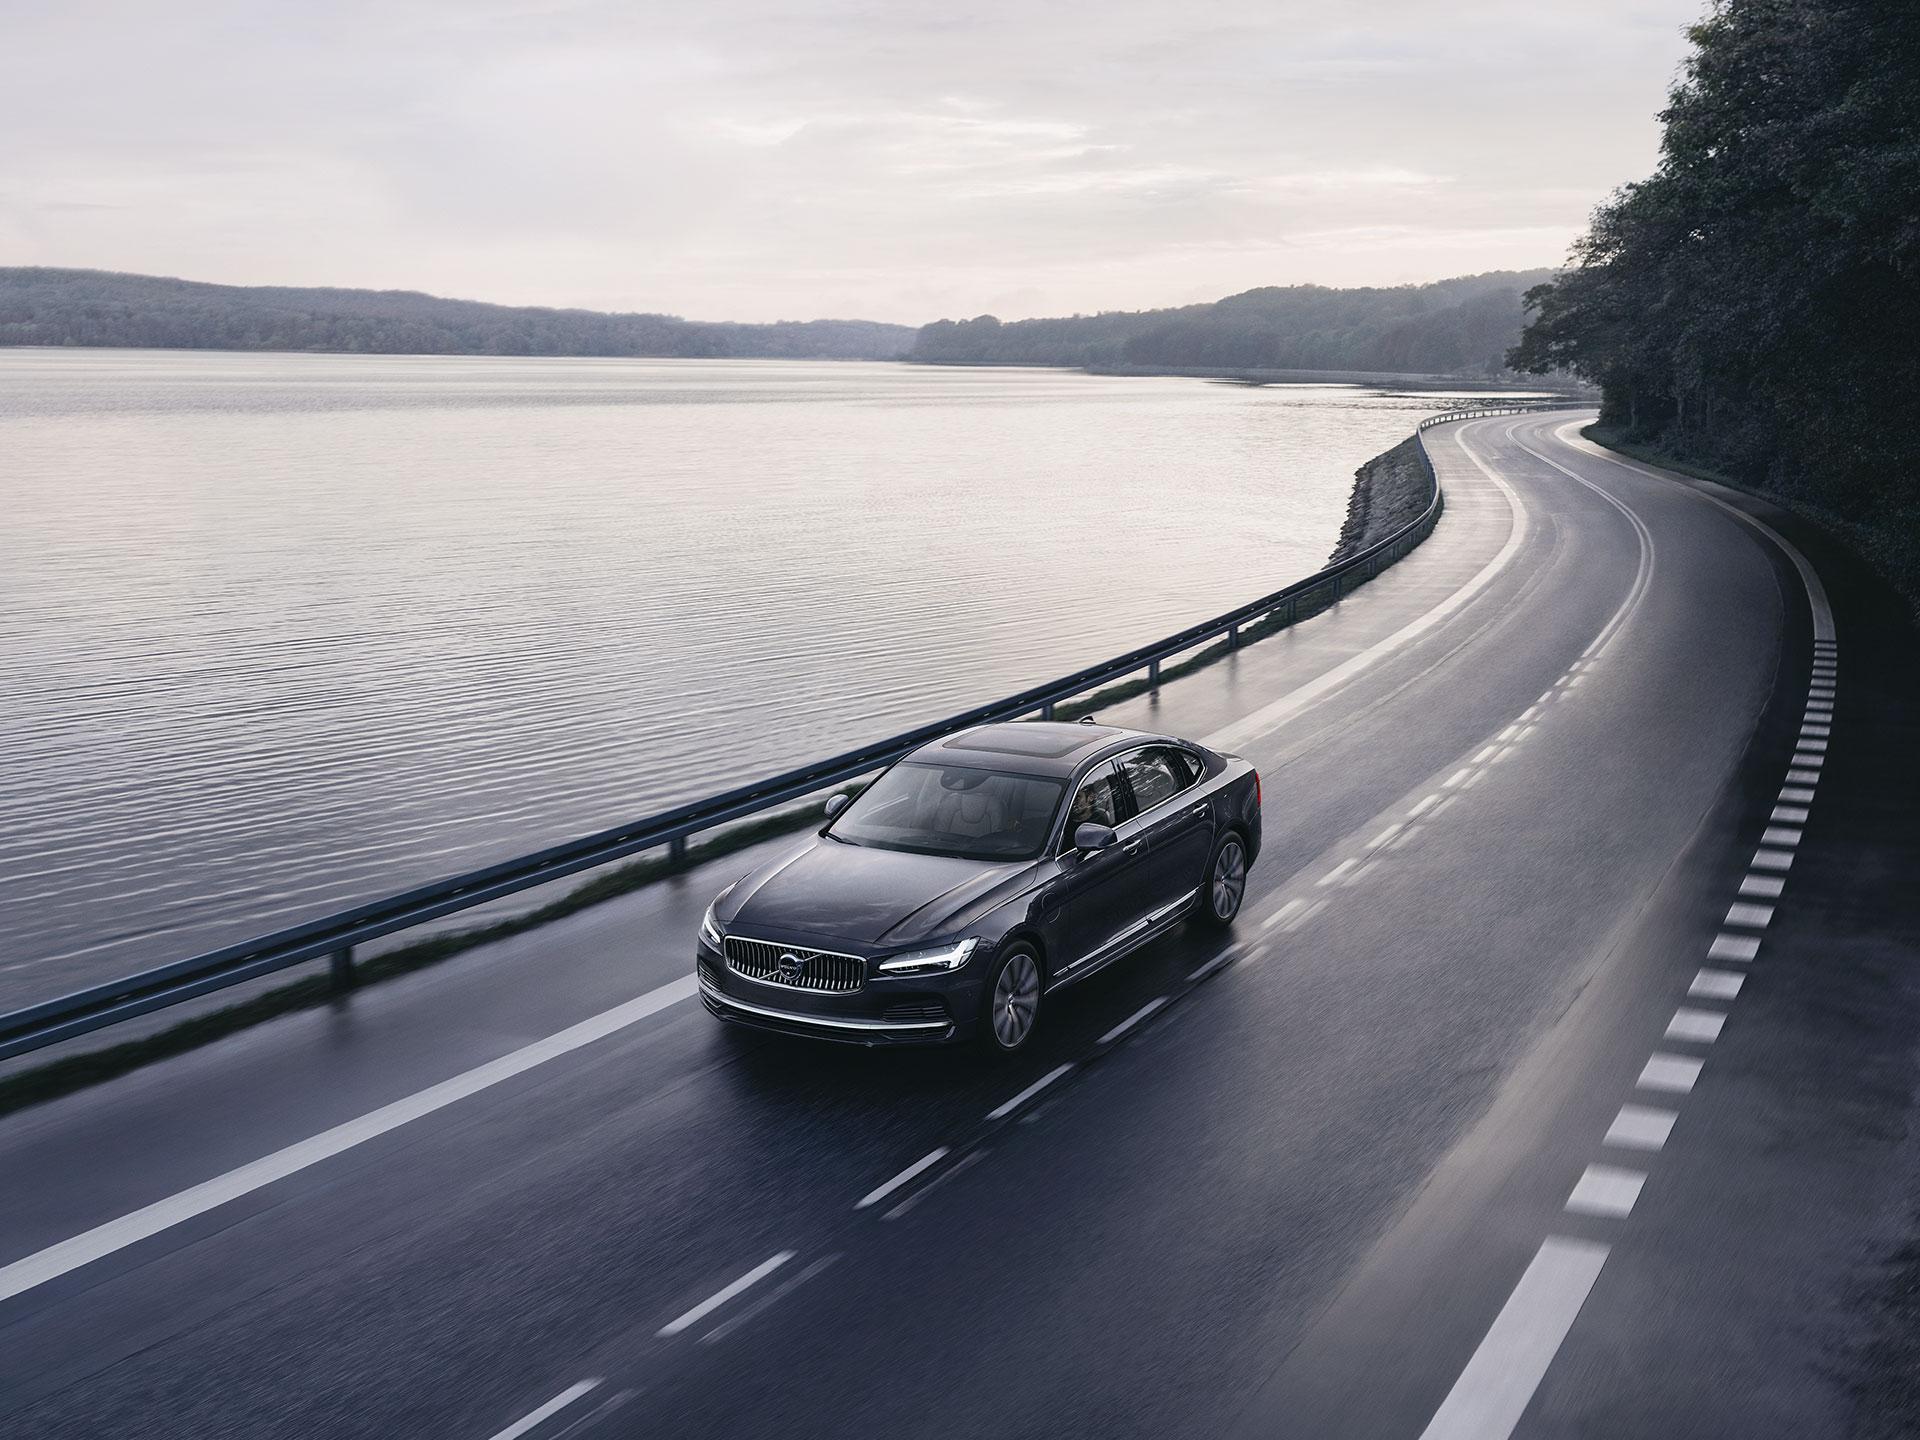 Volvo S90 blagi hibrid vozi po obalskom putu.